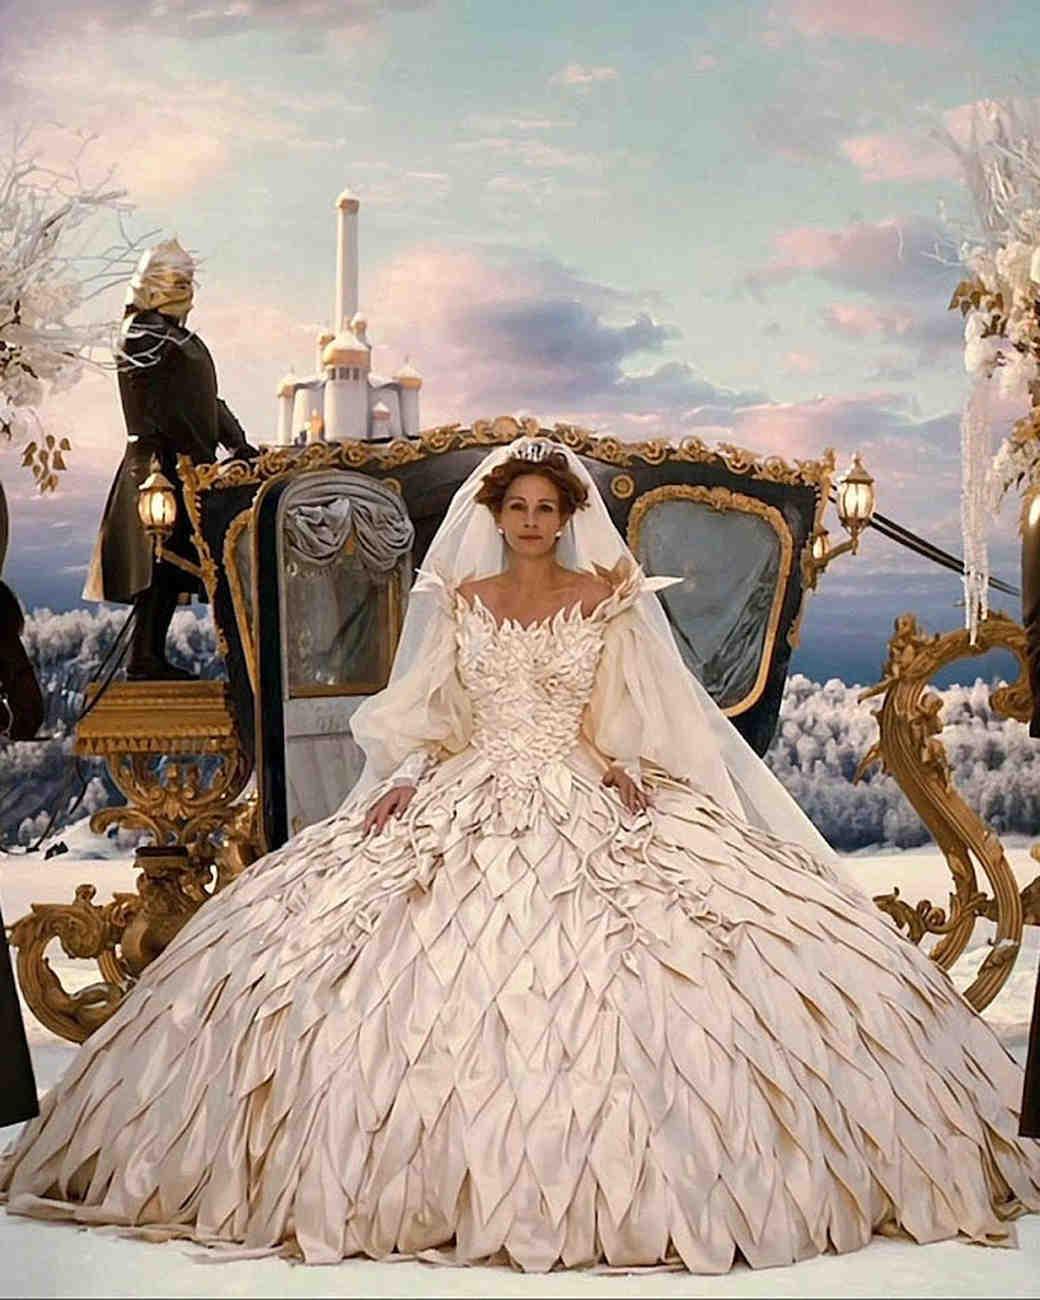 movie-wedding-dresses-mirror-mirror-julia-roberts-0316.jpg